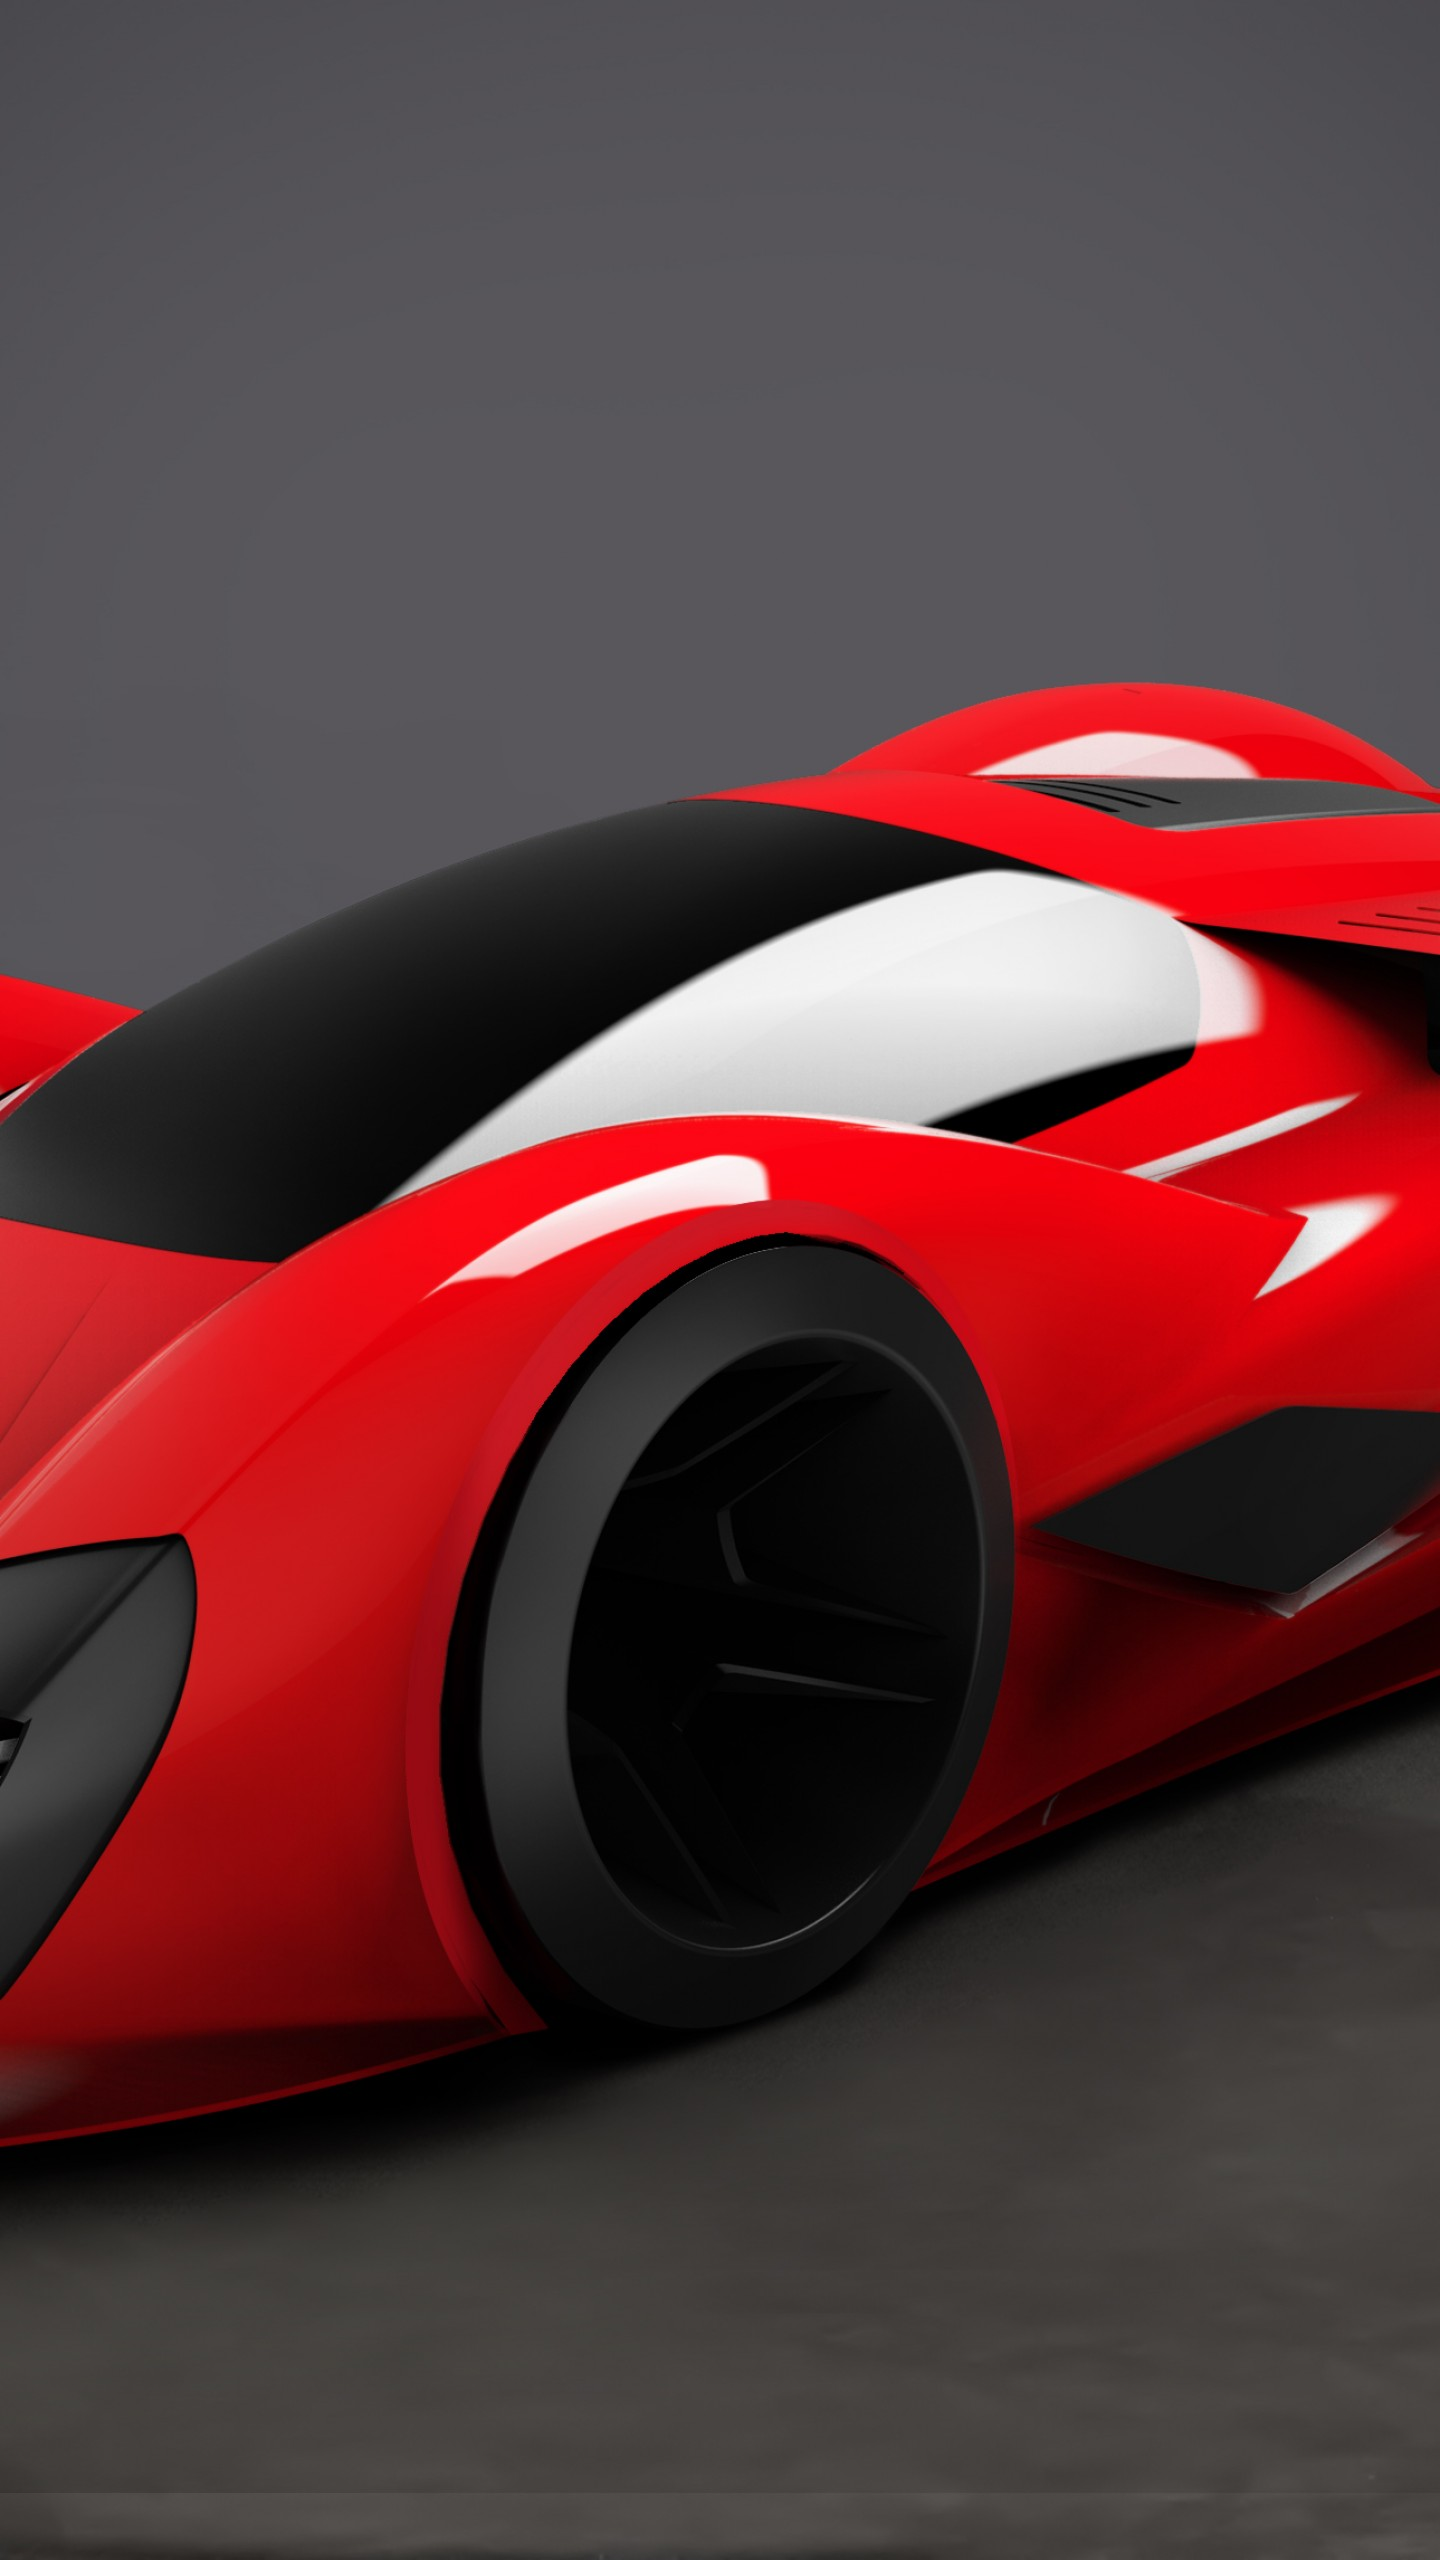 2016 Corvette Z07 >> Wallpaper Ferrari 2040, Parabolica, supercar, Ferrari World Design Contest 2016, FWDC, red, Cars ...